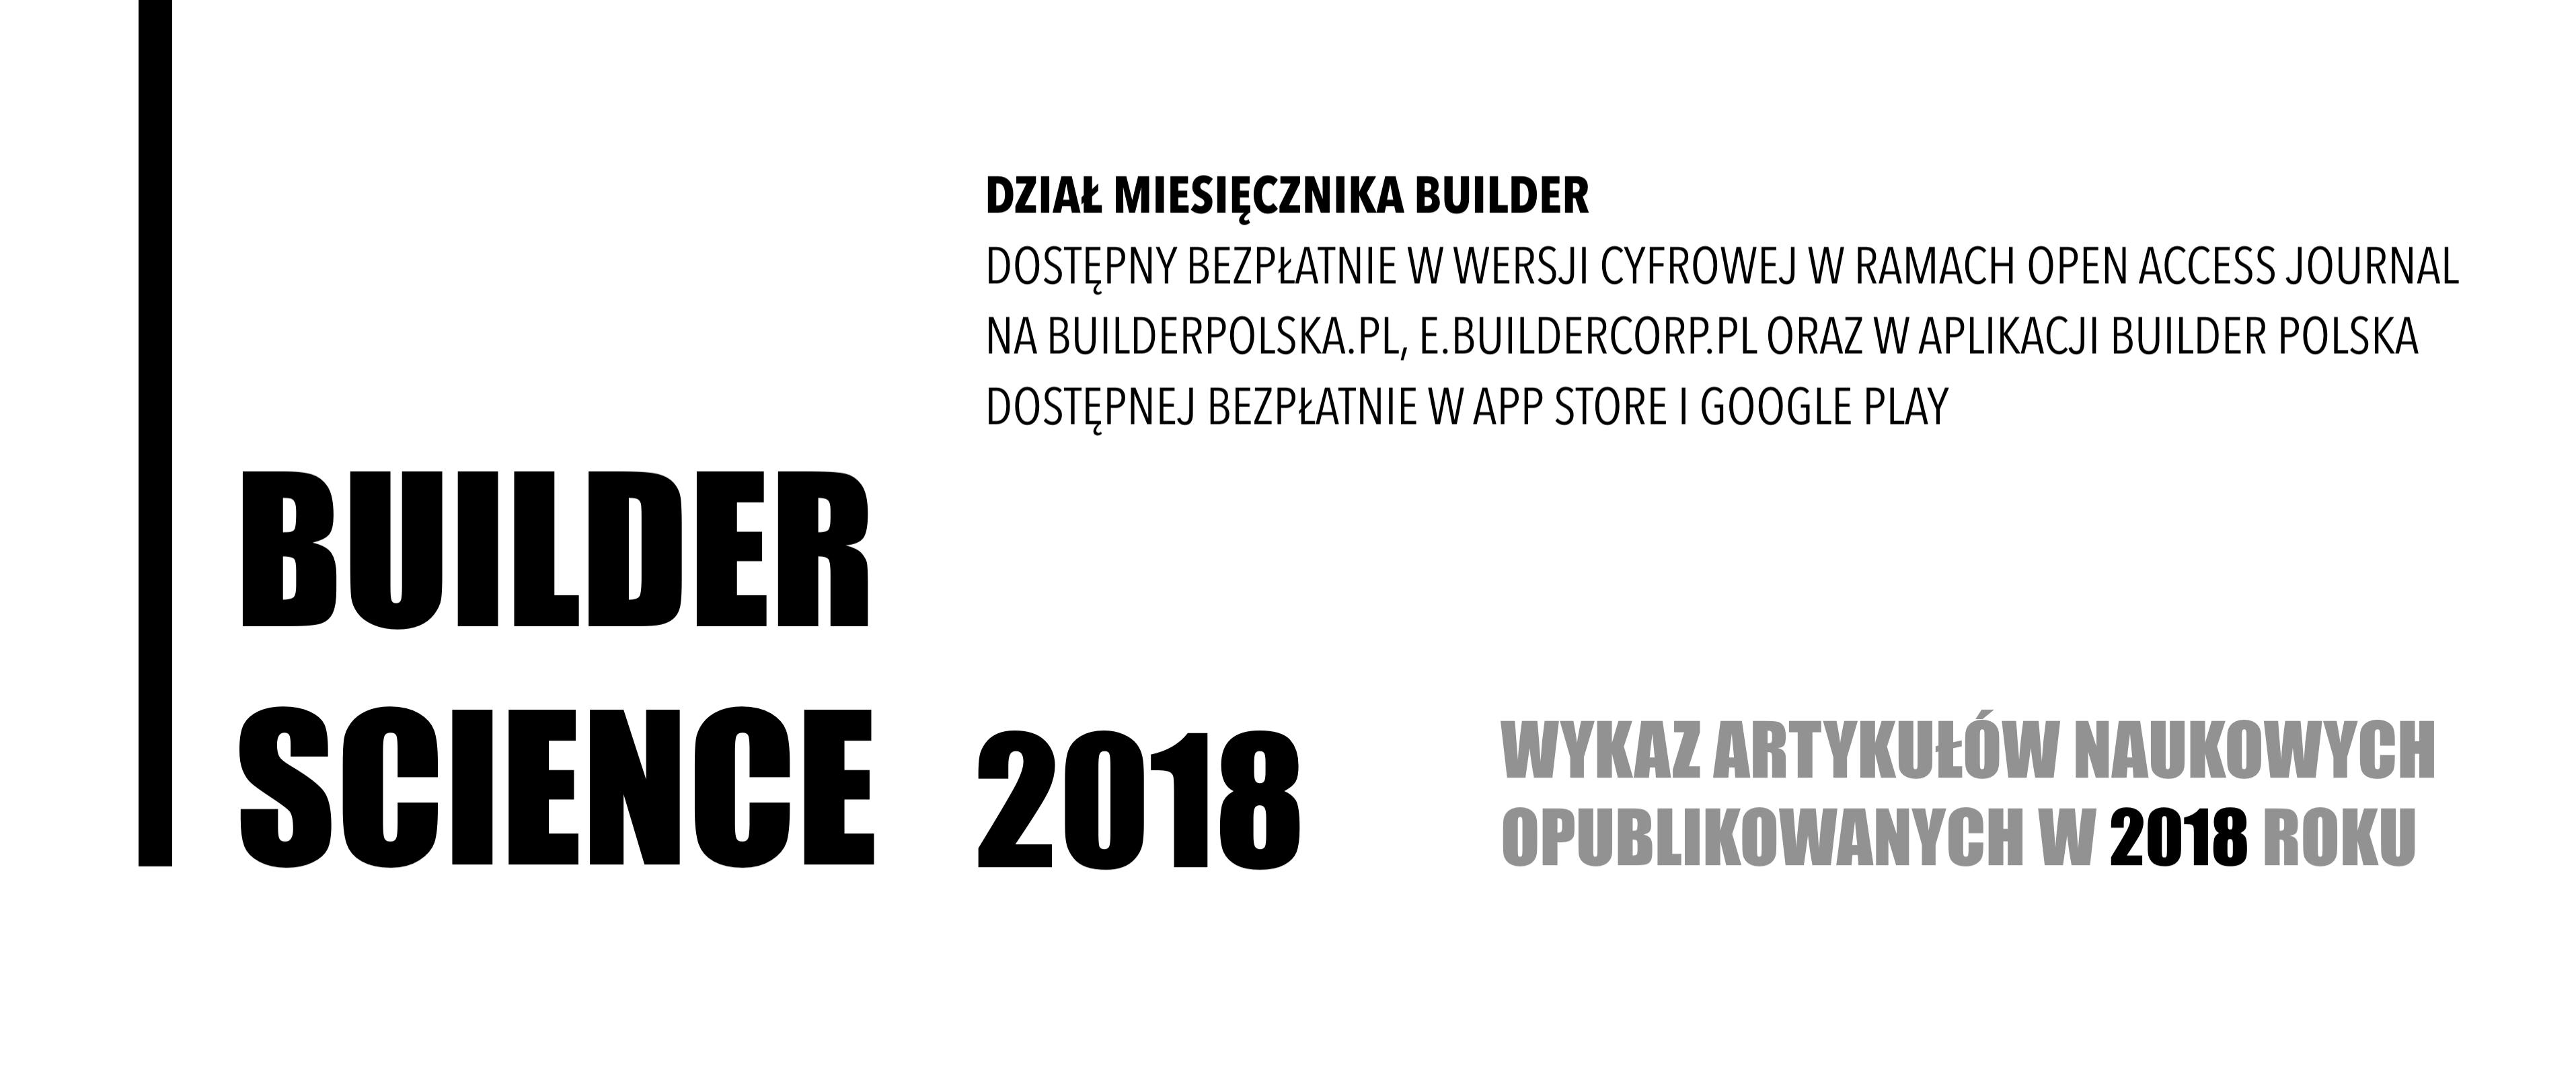 BUILDER SCIENCE  2018